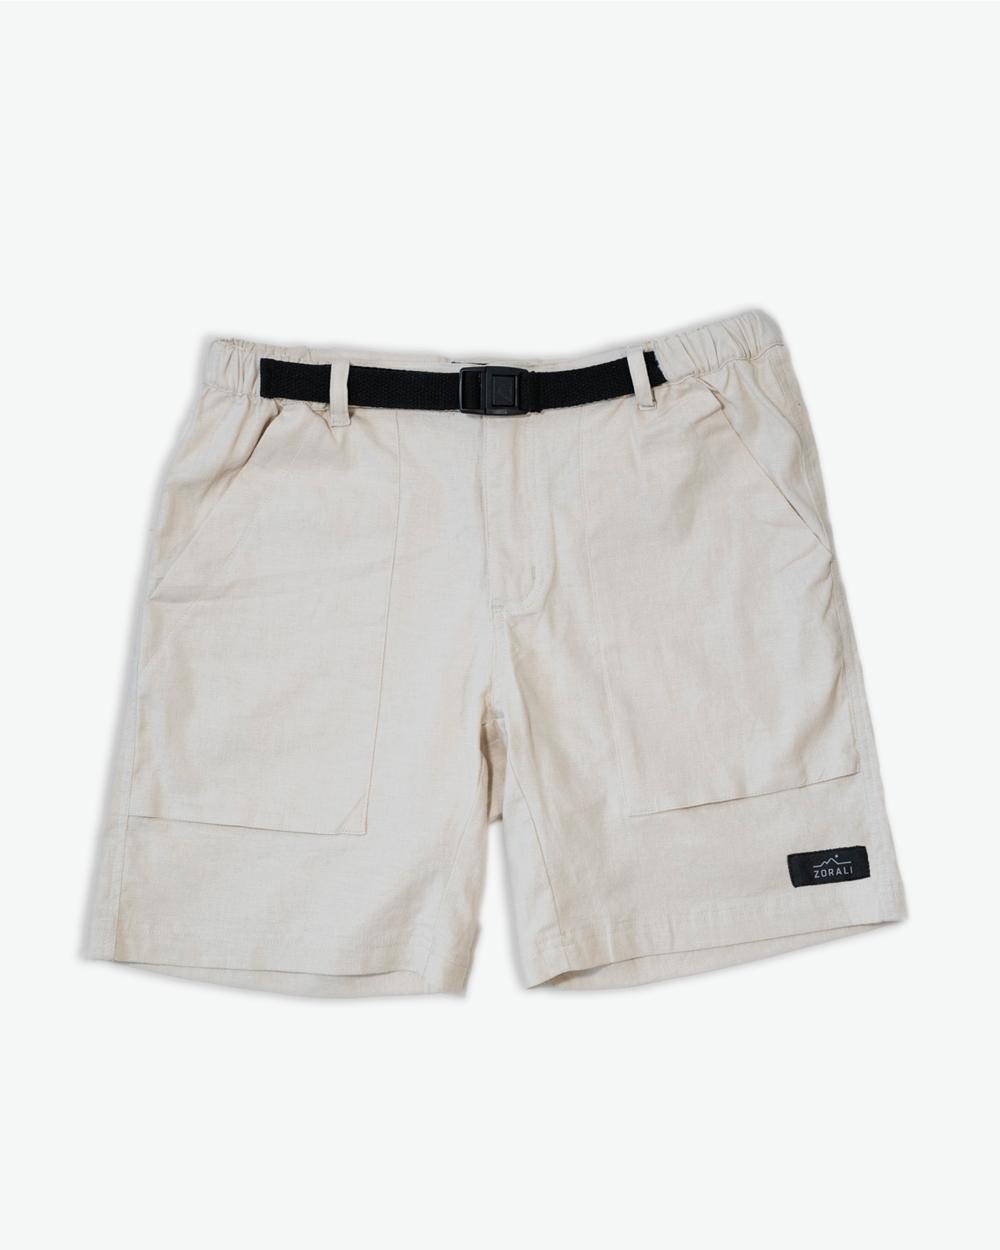 Zorali-Hemp-Shorts-Birch.png